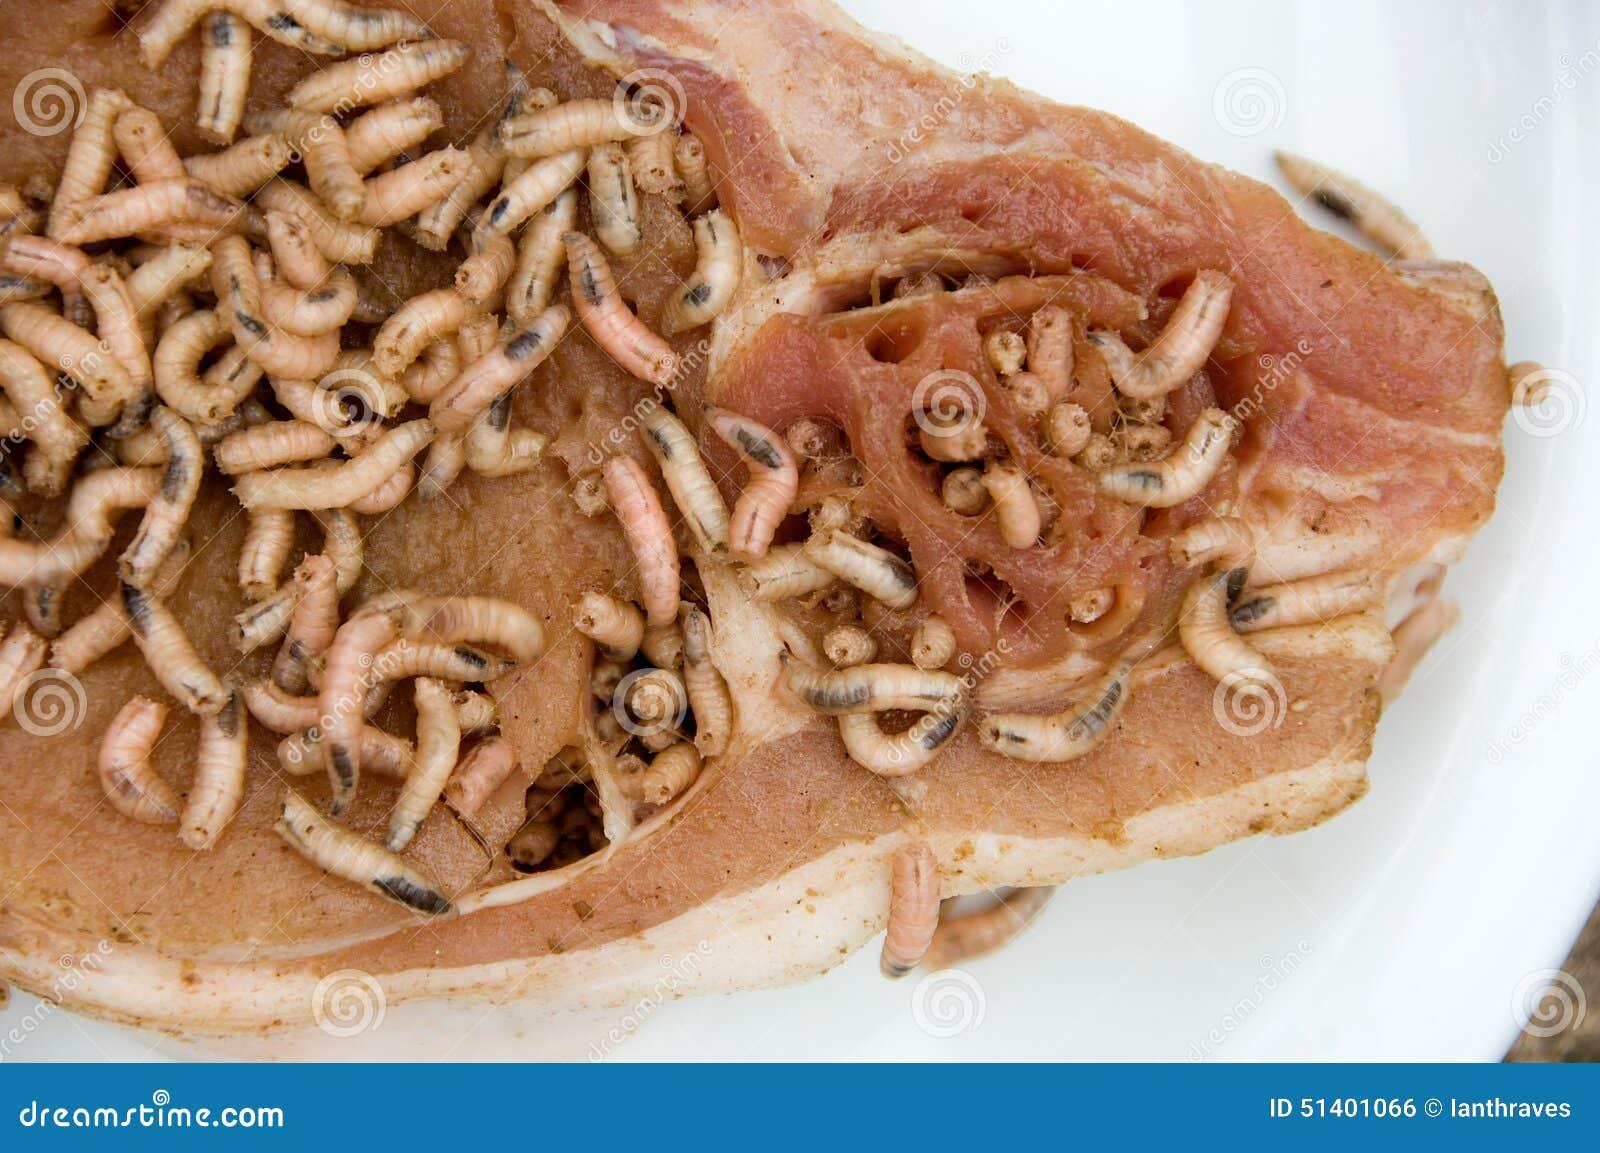 Maggots On Pork Chop Stock Photo - Image: 51401066